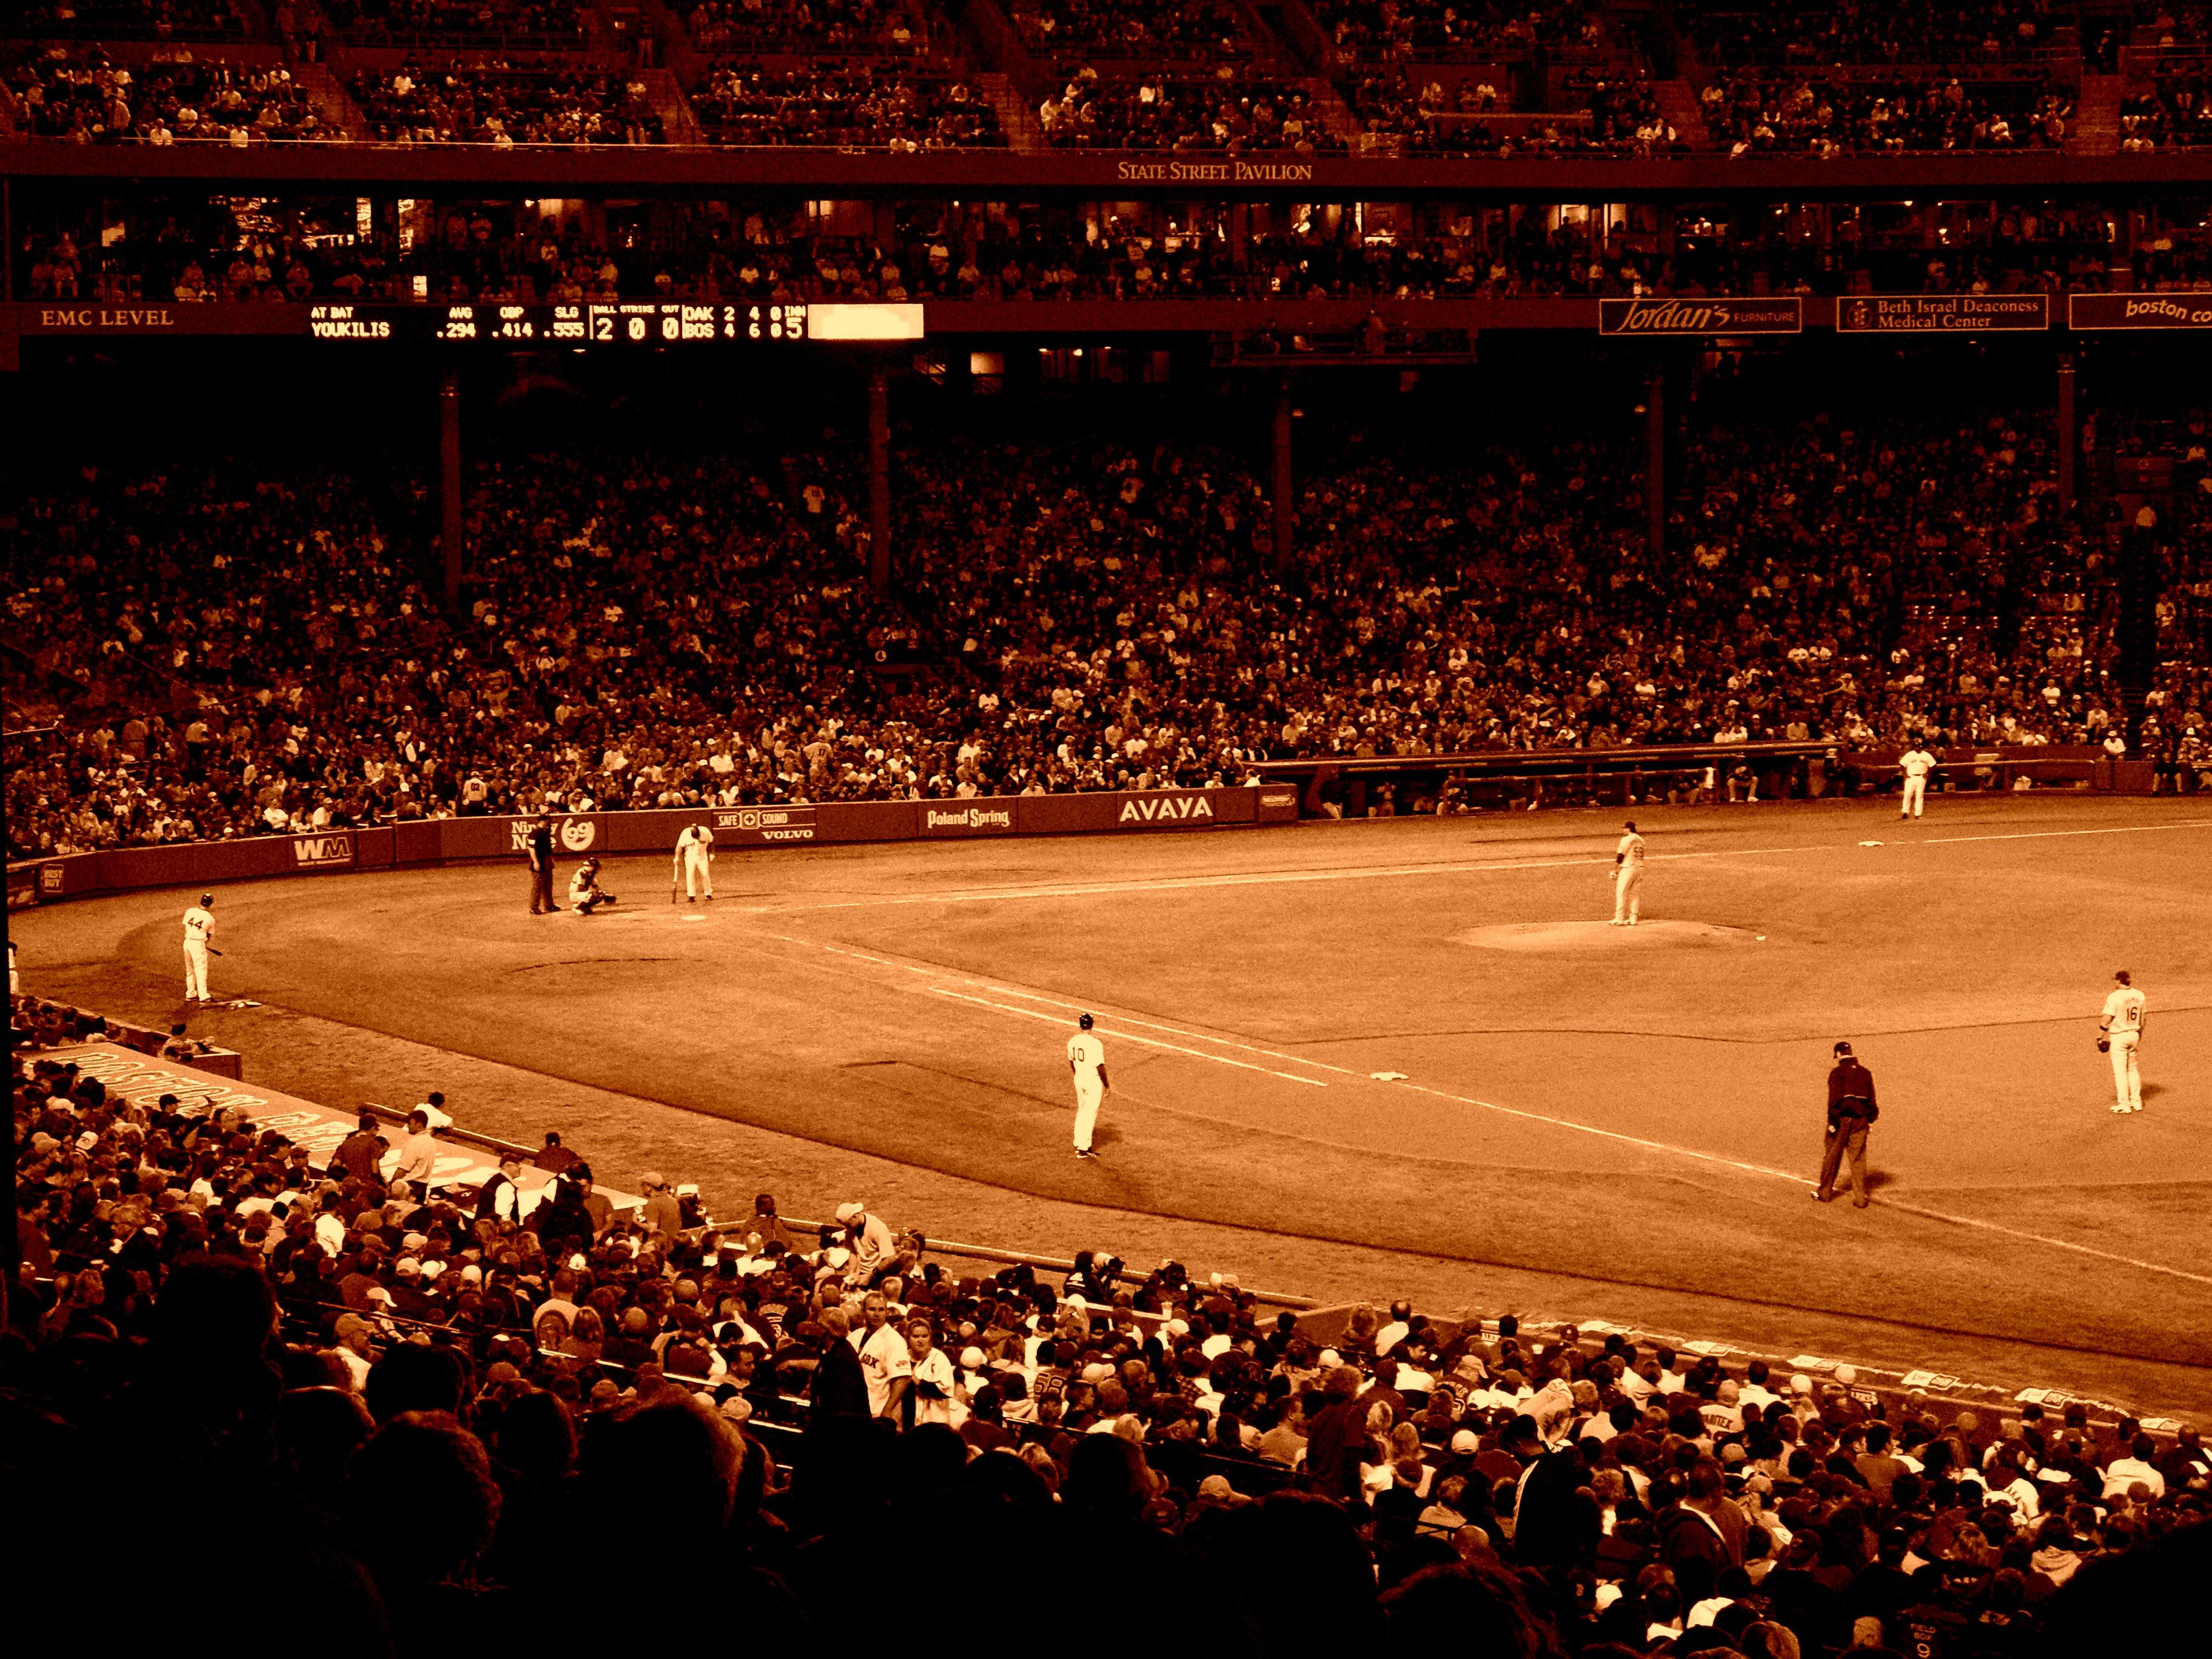 Fenway Park, Ball, Baseball, Boston, Crowds, HQ Photo